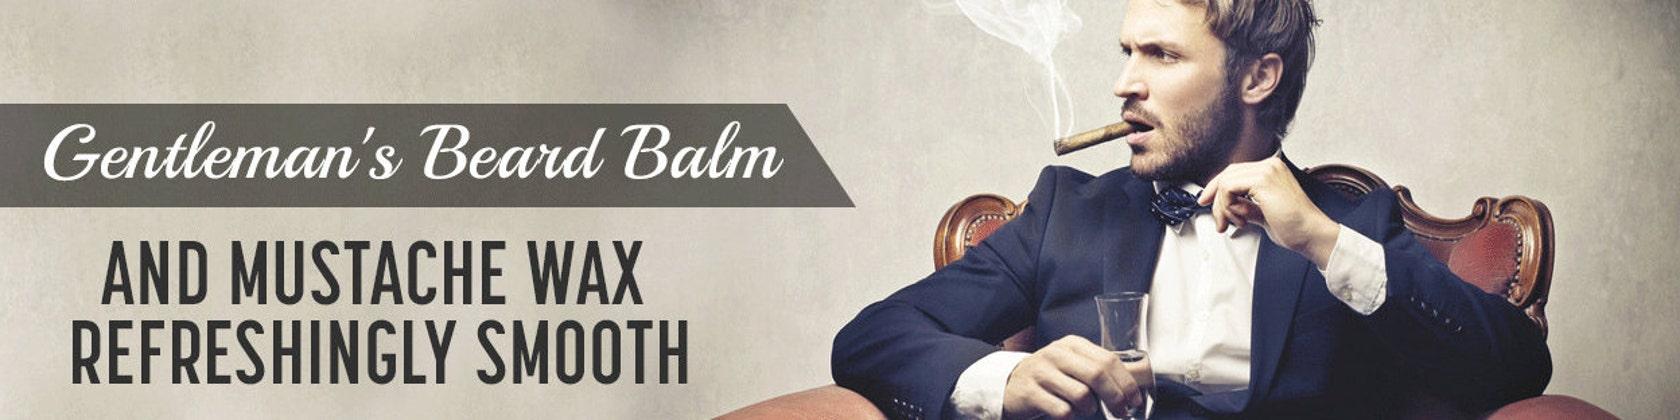 gentleman 39 s beard balm beard oil and by gentlemansbeardbalm. Black Bedroom Furniture Sets. Home Design Ideas